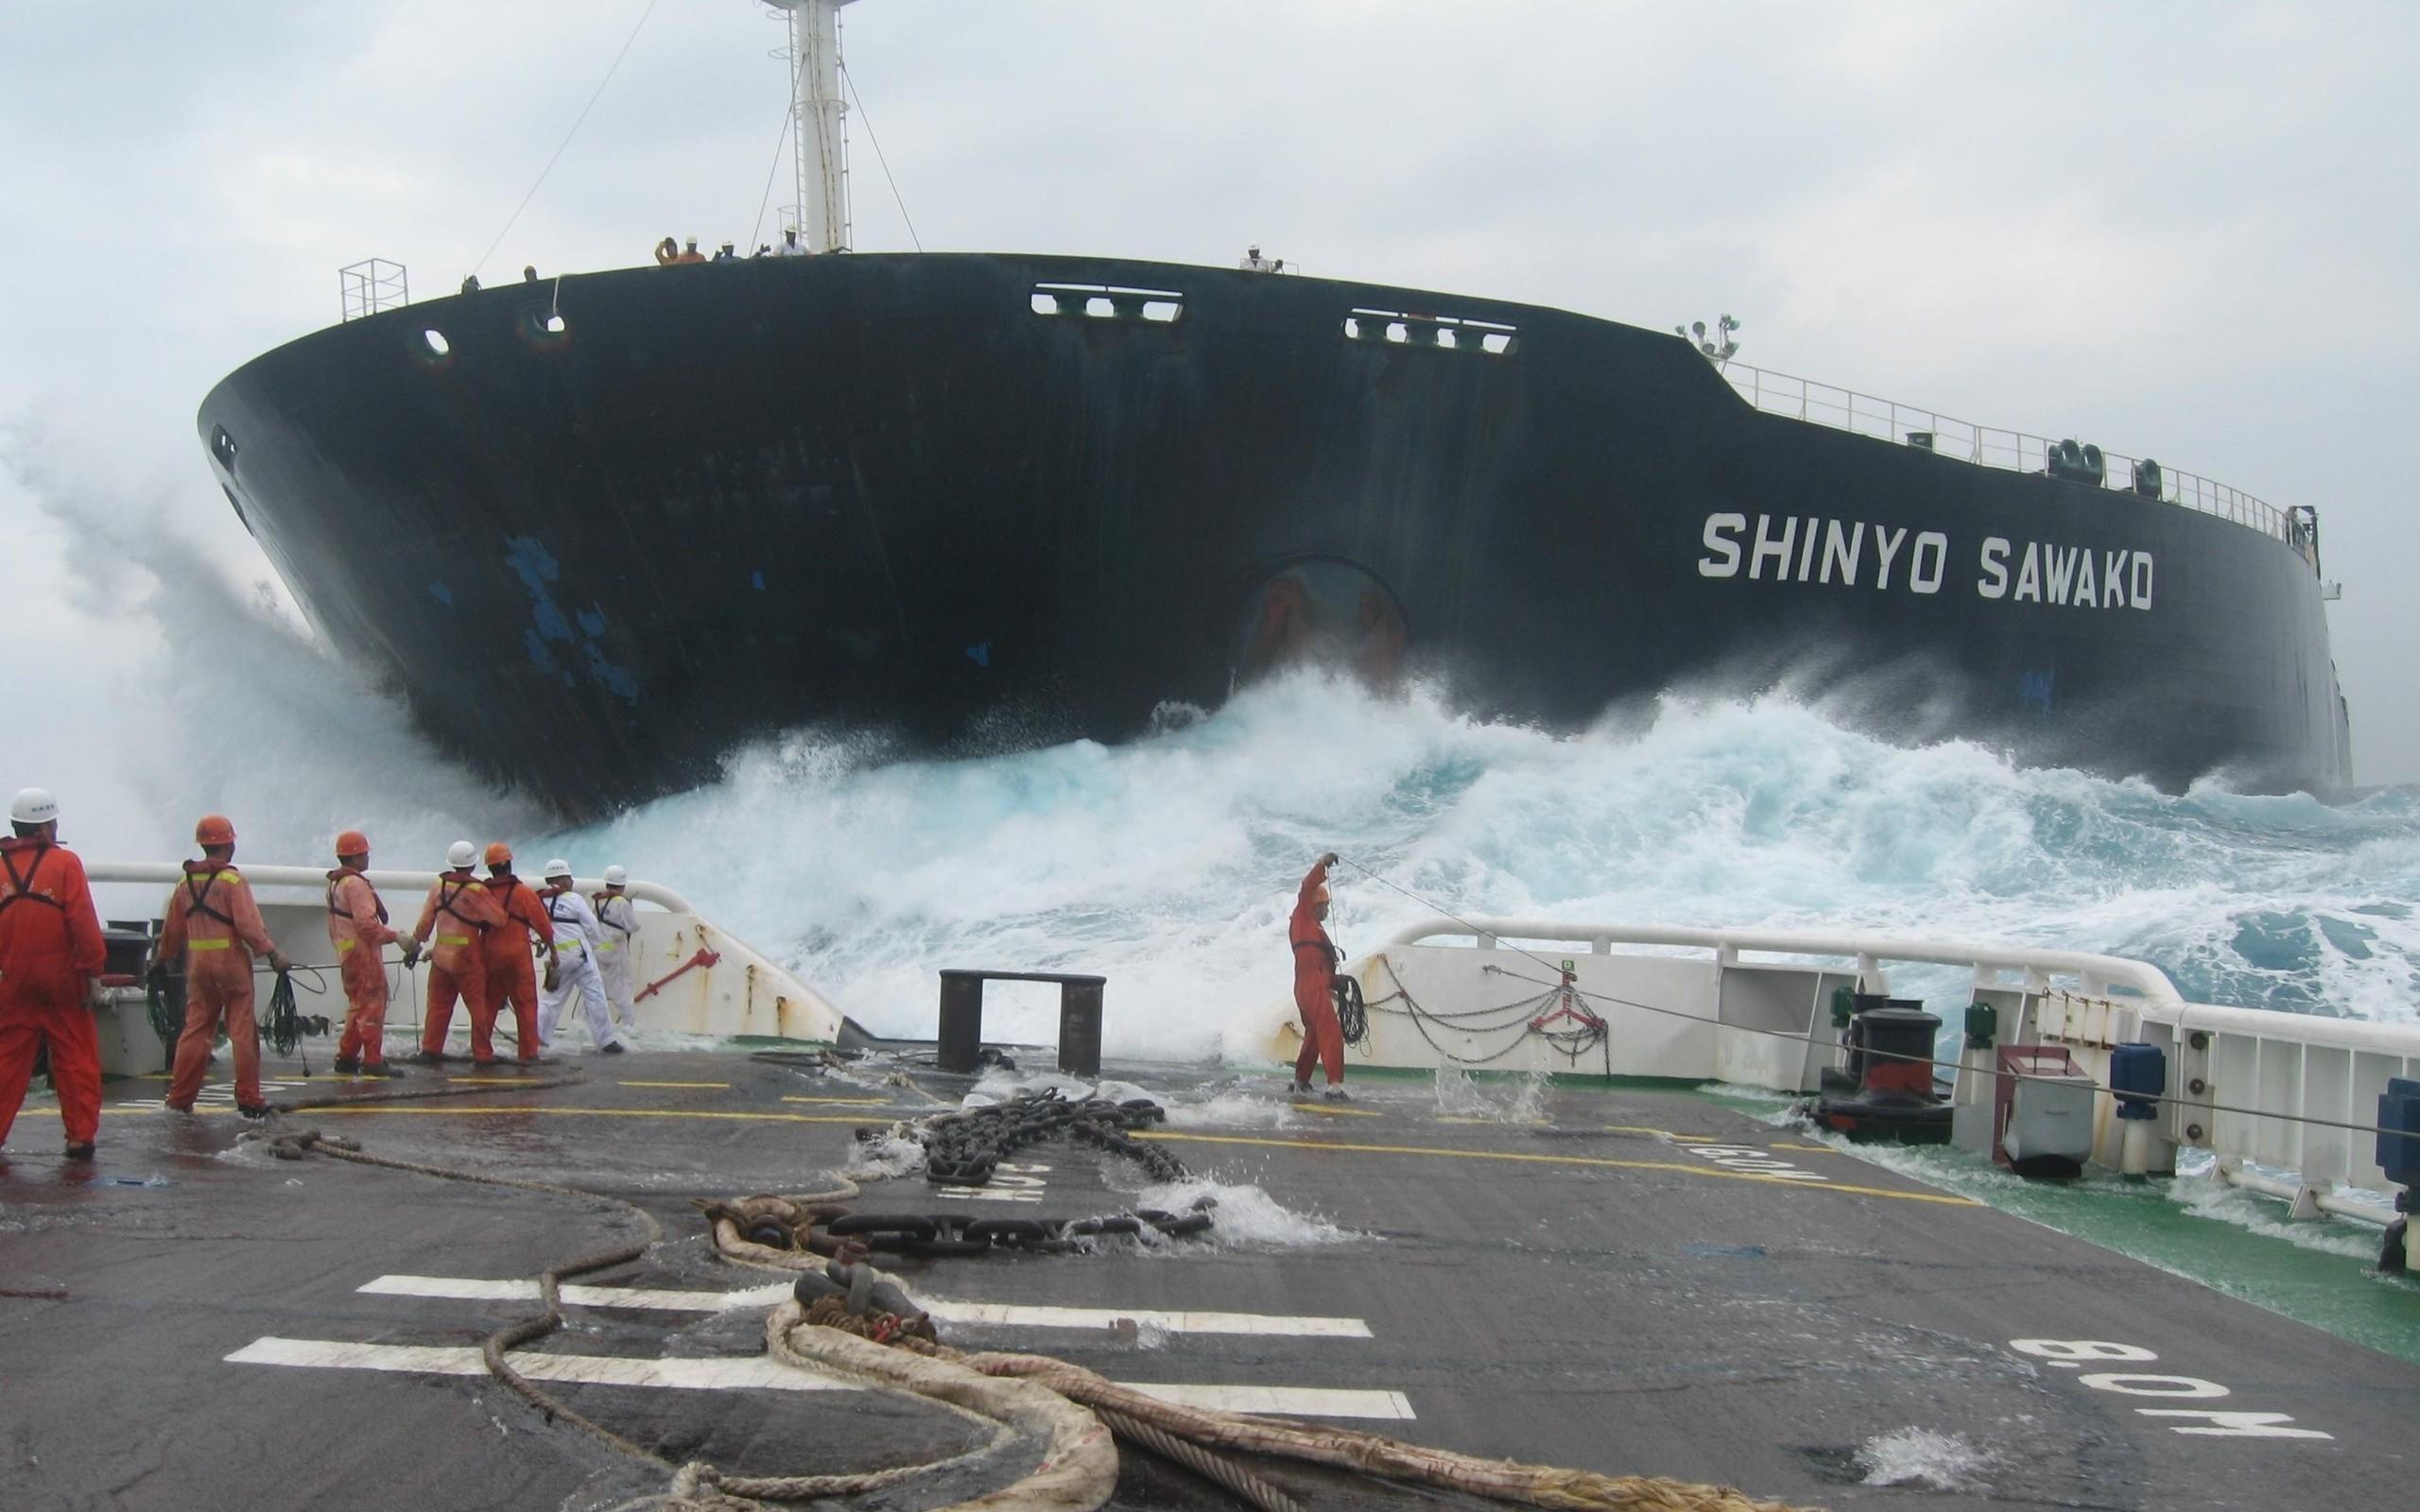 1 - A tugboat approaches Hong Kong freighter, the Shinyo Sawako